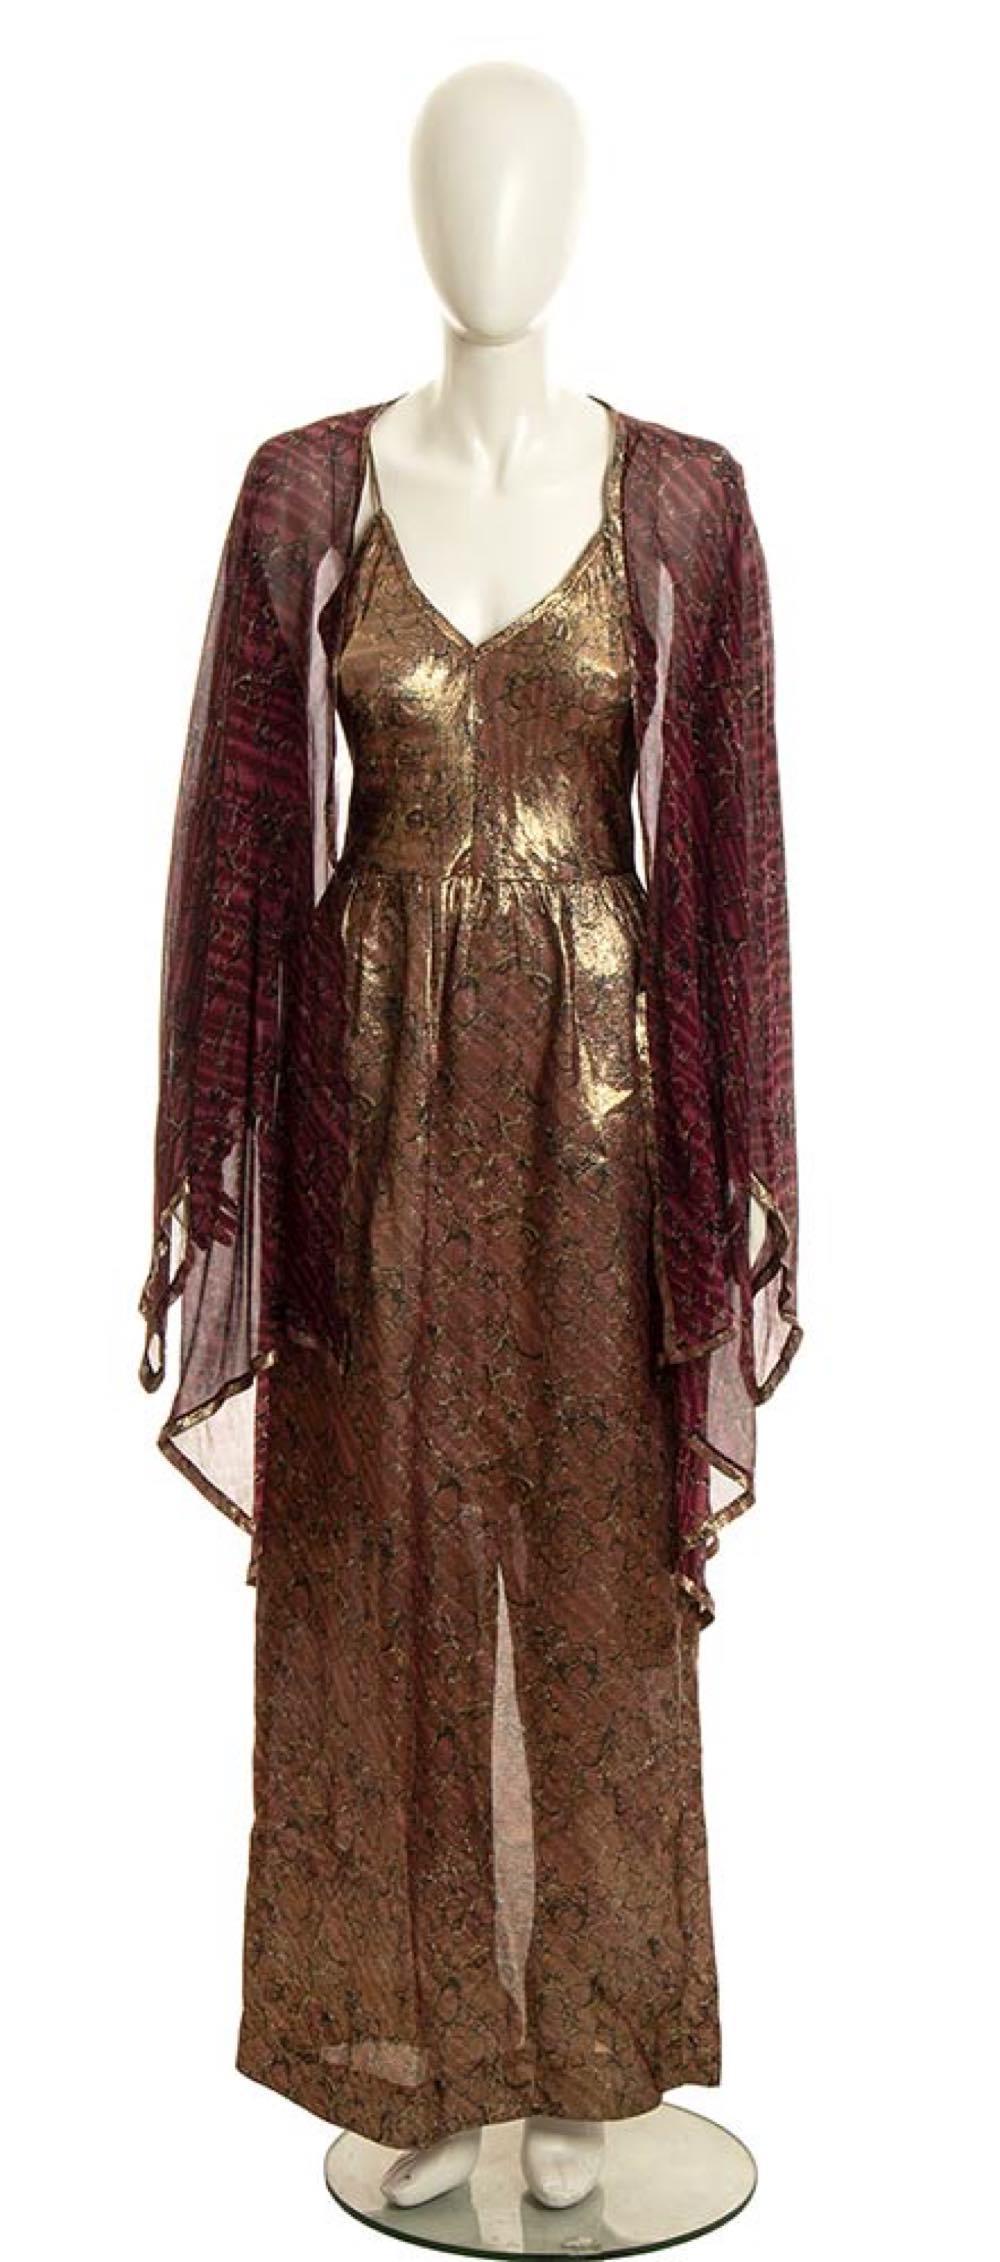 ANNABELLE PARIS - EVENING DRESS - 70s